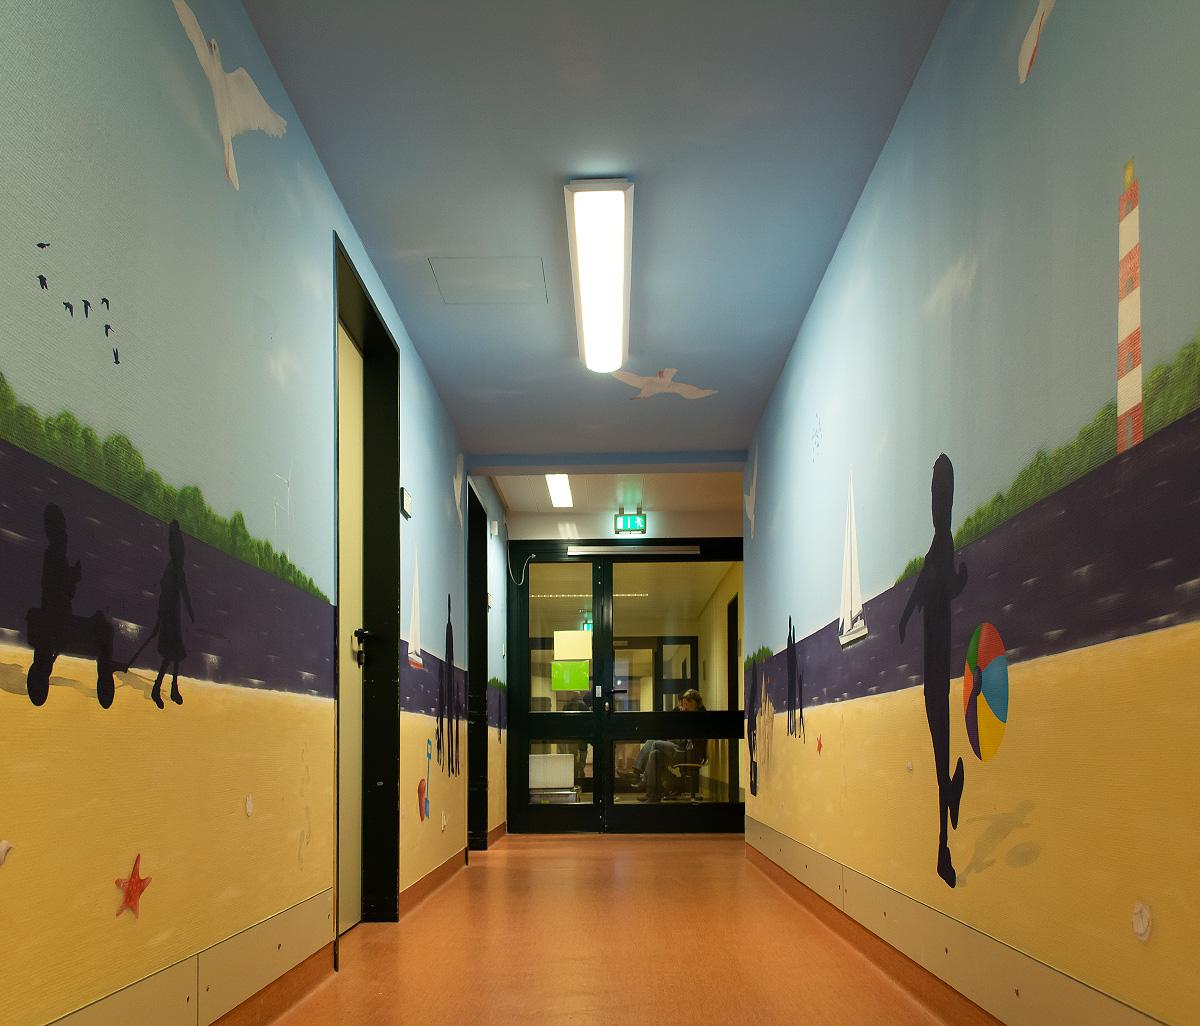 wandgestaltung_krankenhaus_graffiti_maler_02